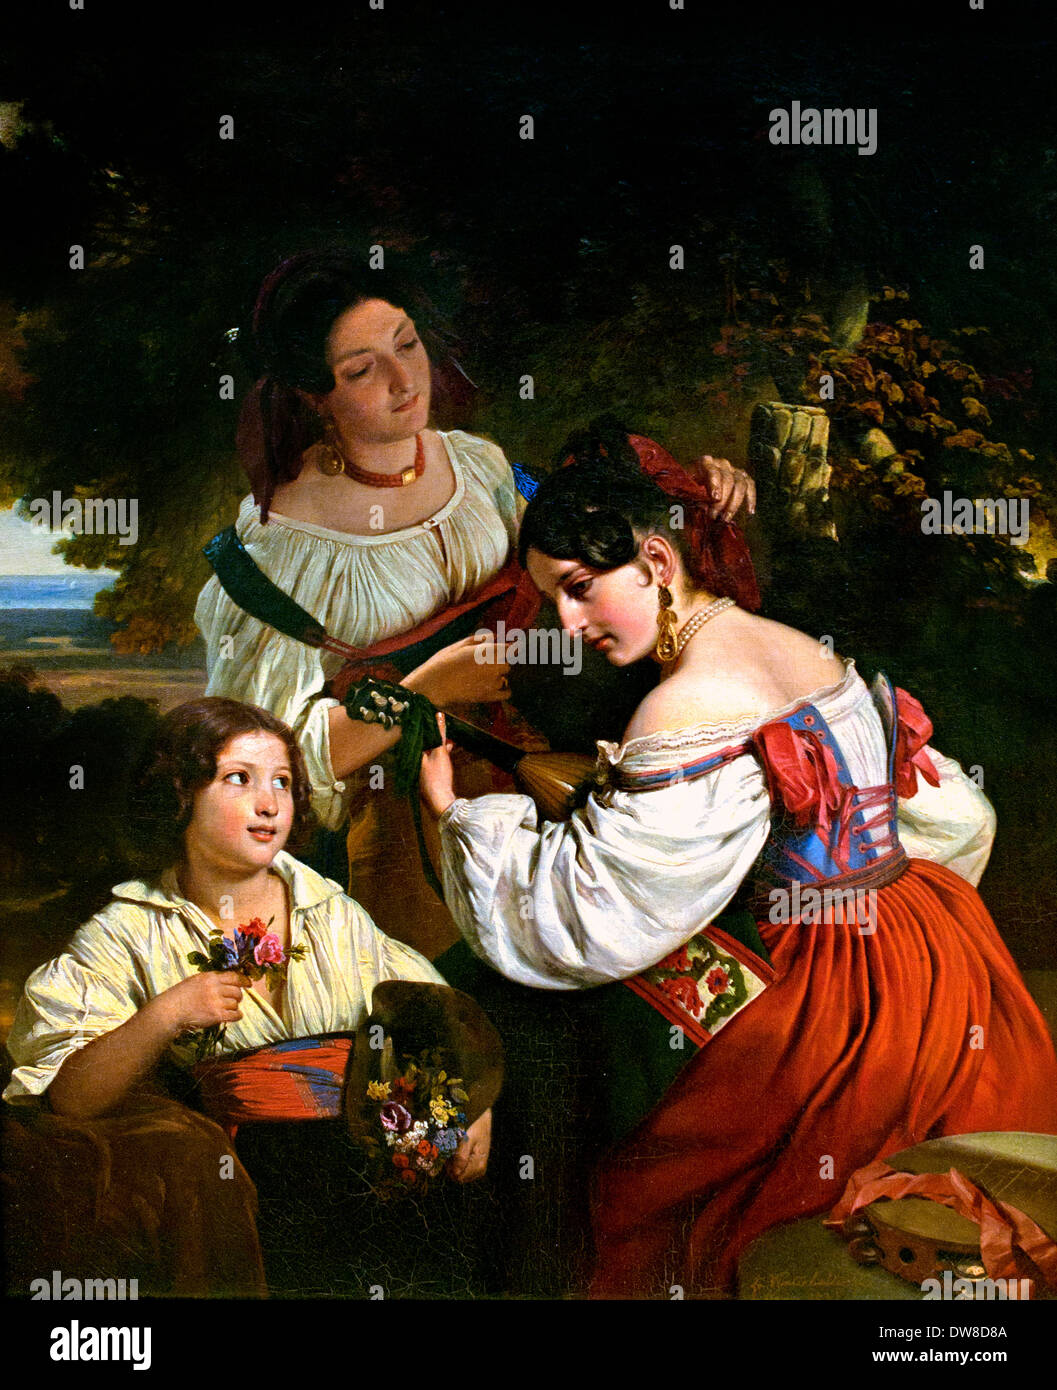 Roman Genre Scene 1833 Franz Xaver Winterhalter1805 - 1873 German Germany - Stock Image